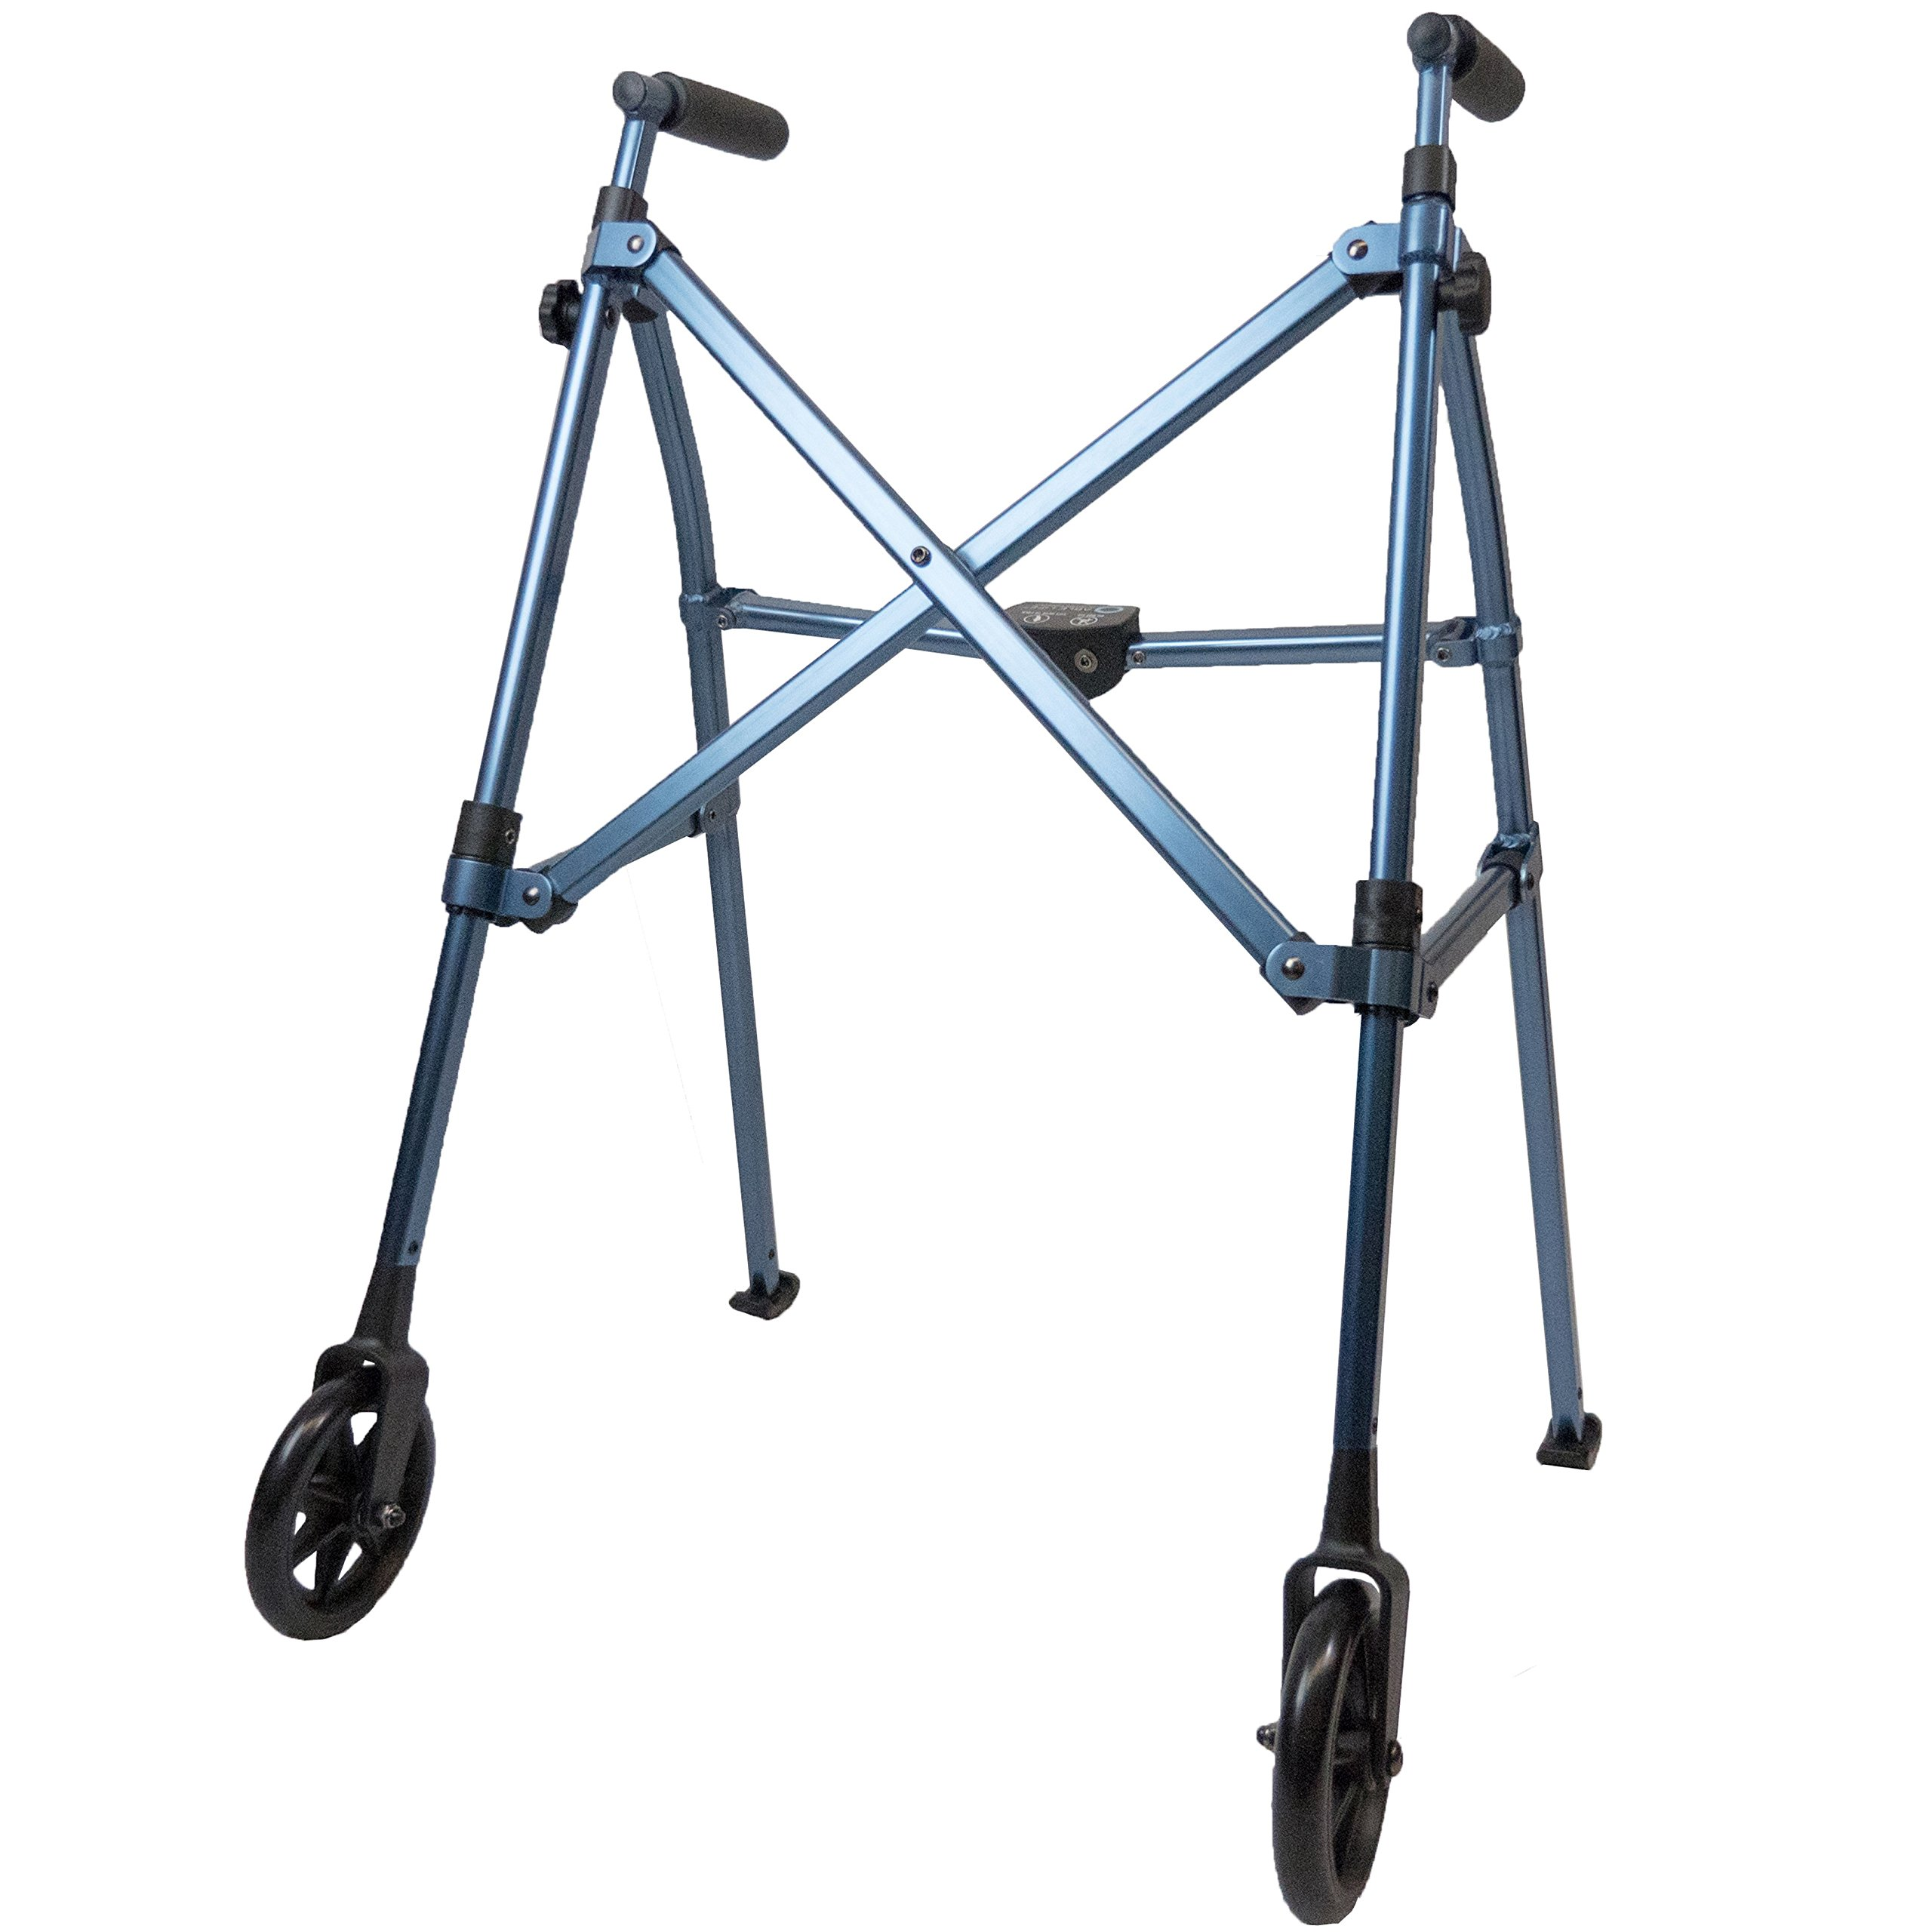 Able Life Space Saver Walker - Lightweight Folding & Height Adjustable Adult Travel Walker for Seniors + Fixed Wheels & Rear Glides - Cobalt Blue